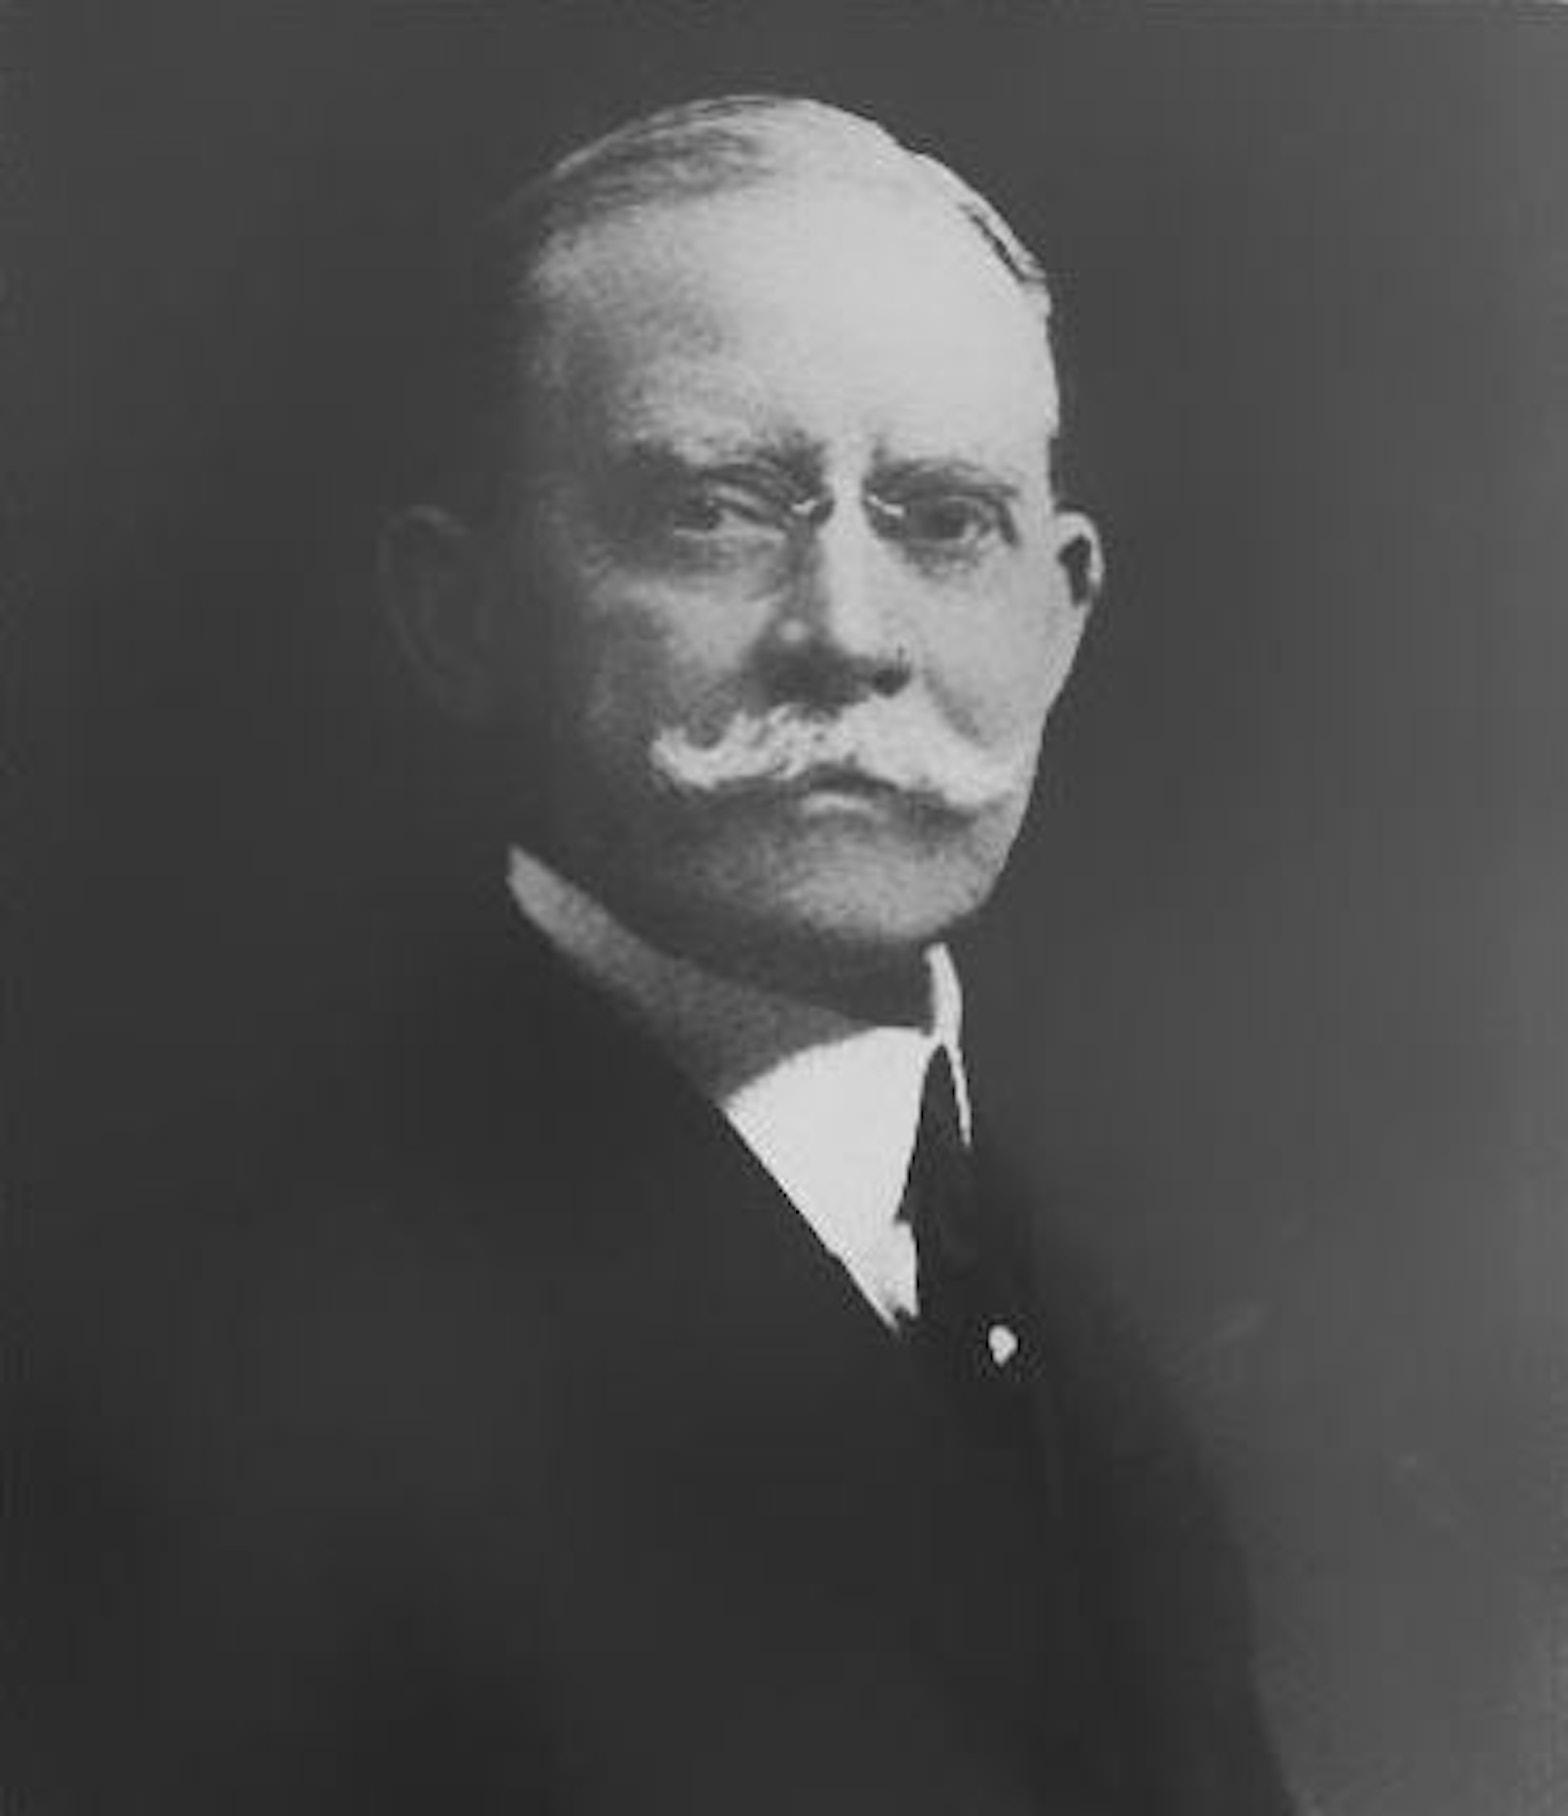 Photo of John Henry Patterson